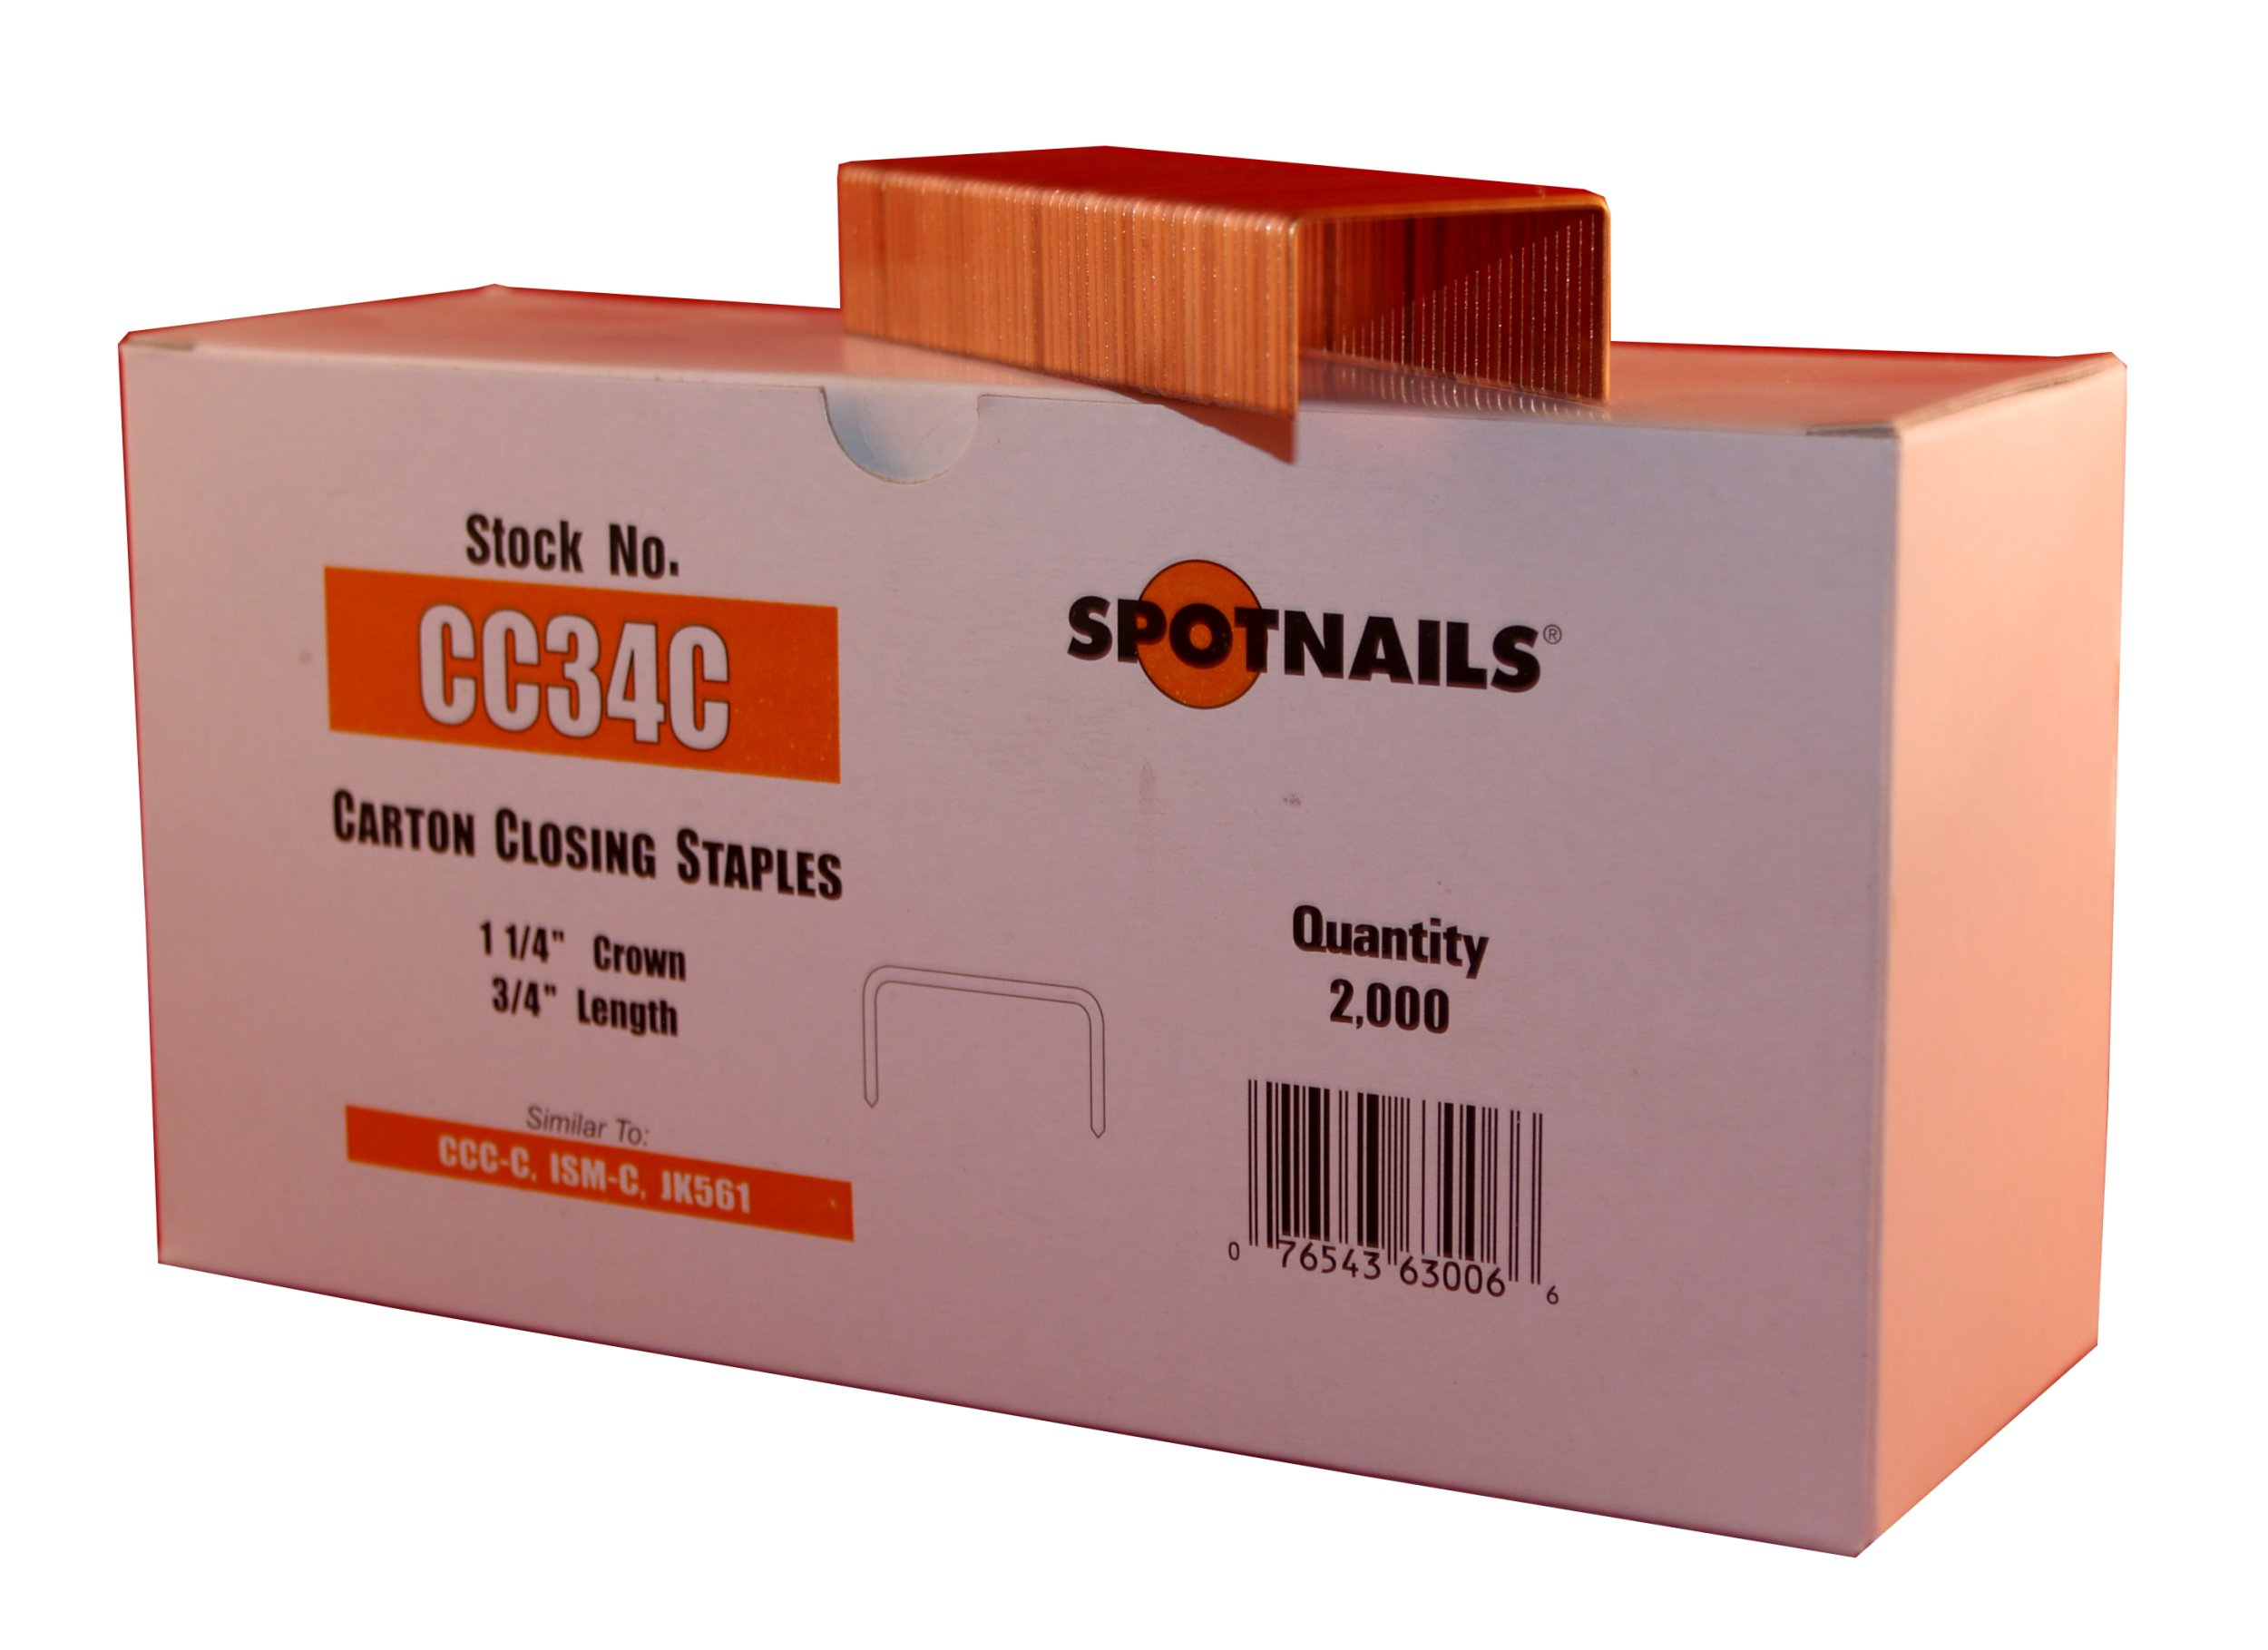 Spot Nails CC34C 1-1/4-Inch Crown 3/4-Inch Leg Carton Closing Staple (Quantity 2000)